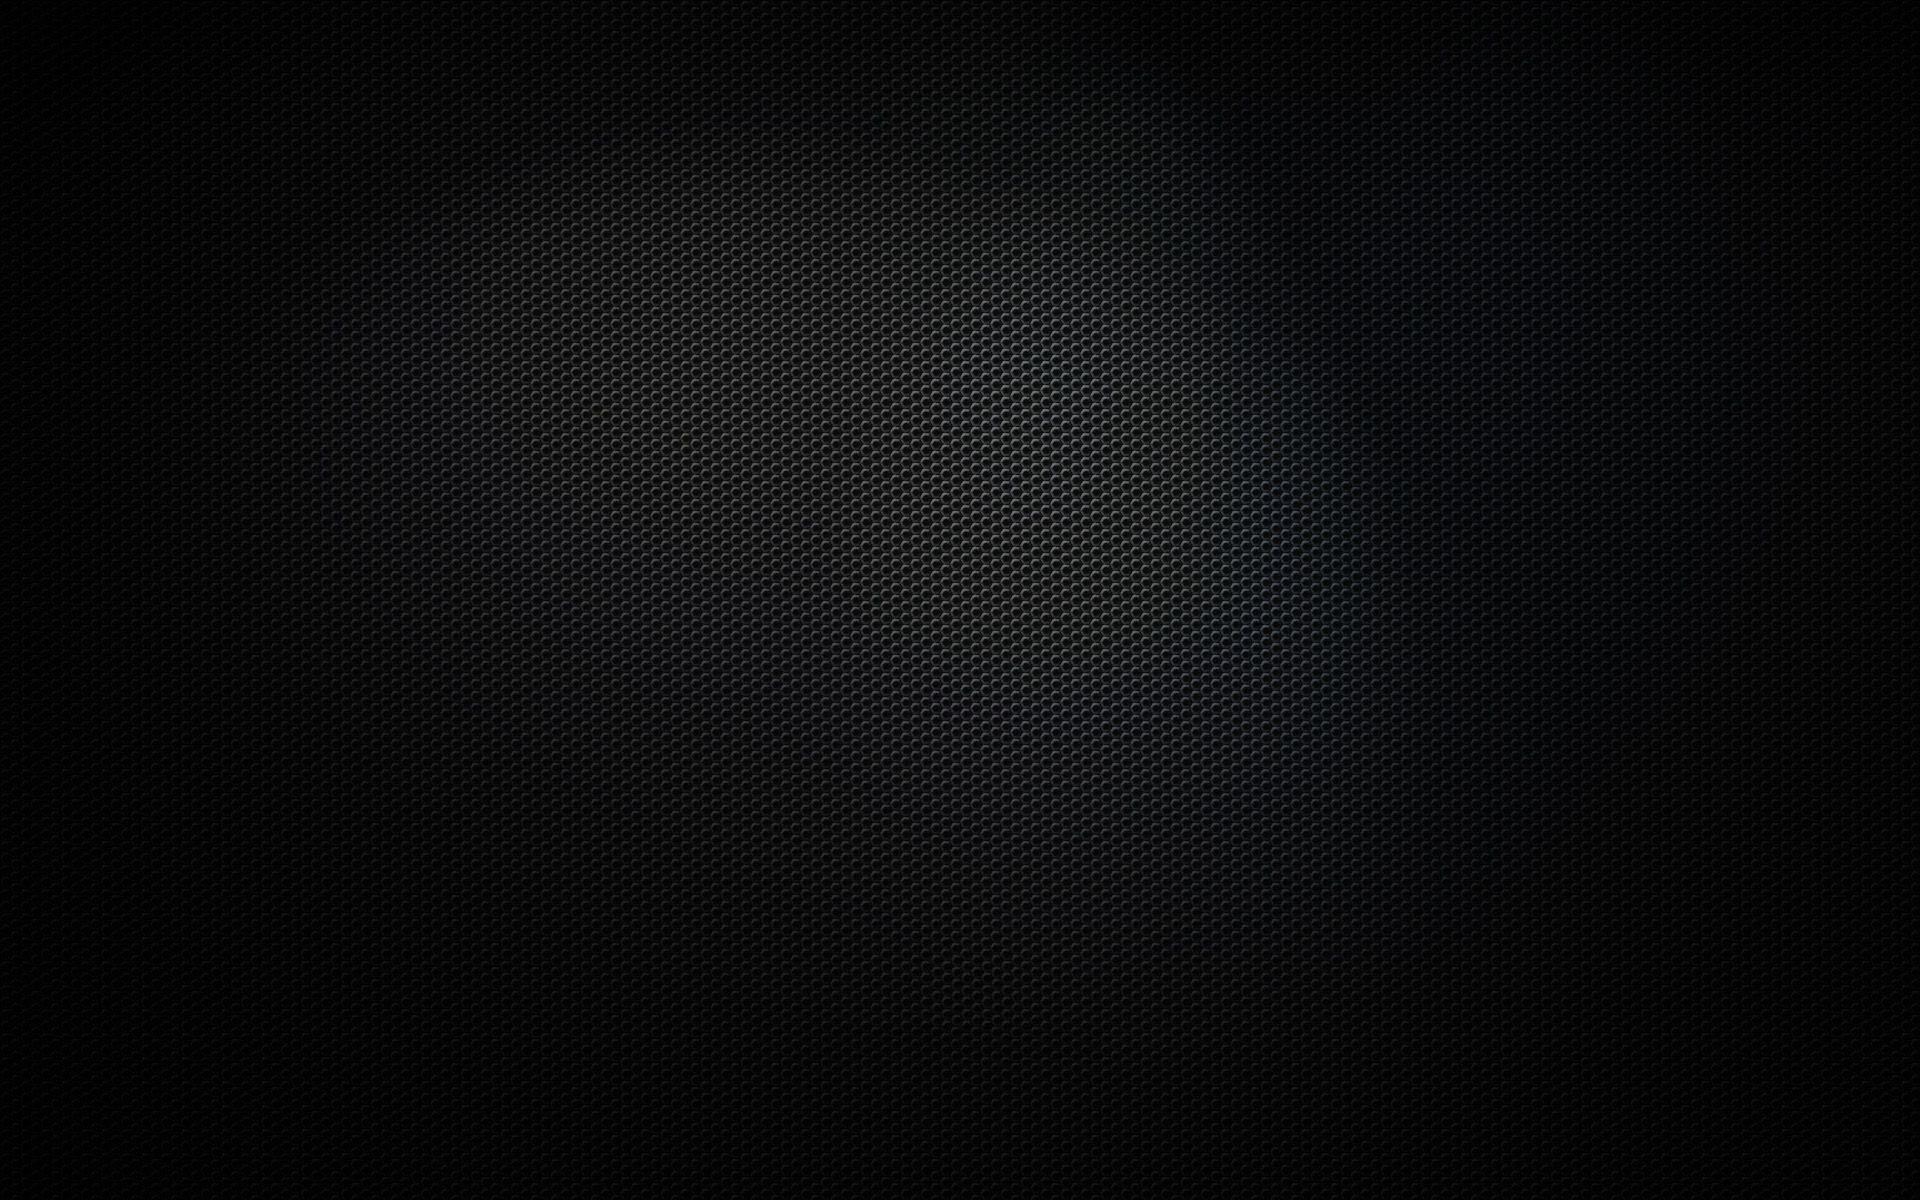 Abstract Wallpaper Dark Posted By John Peltier